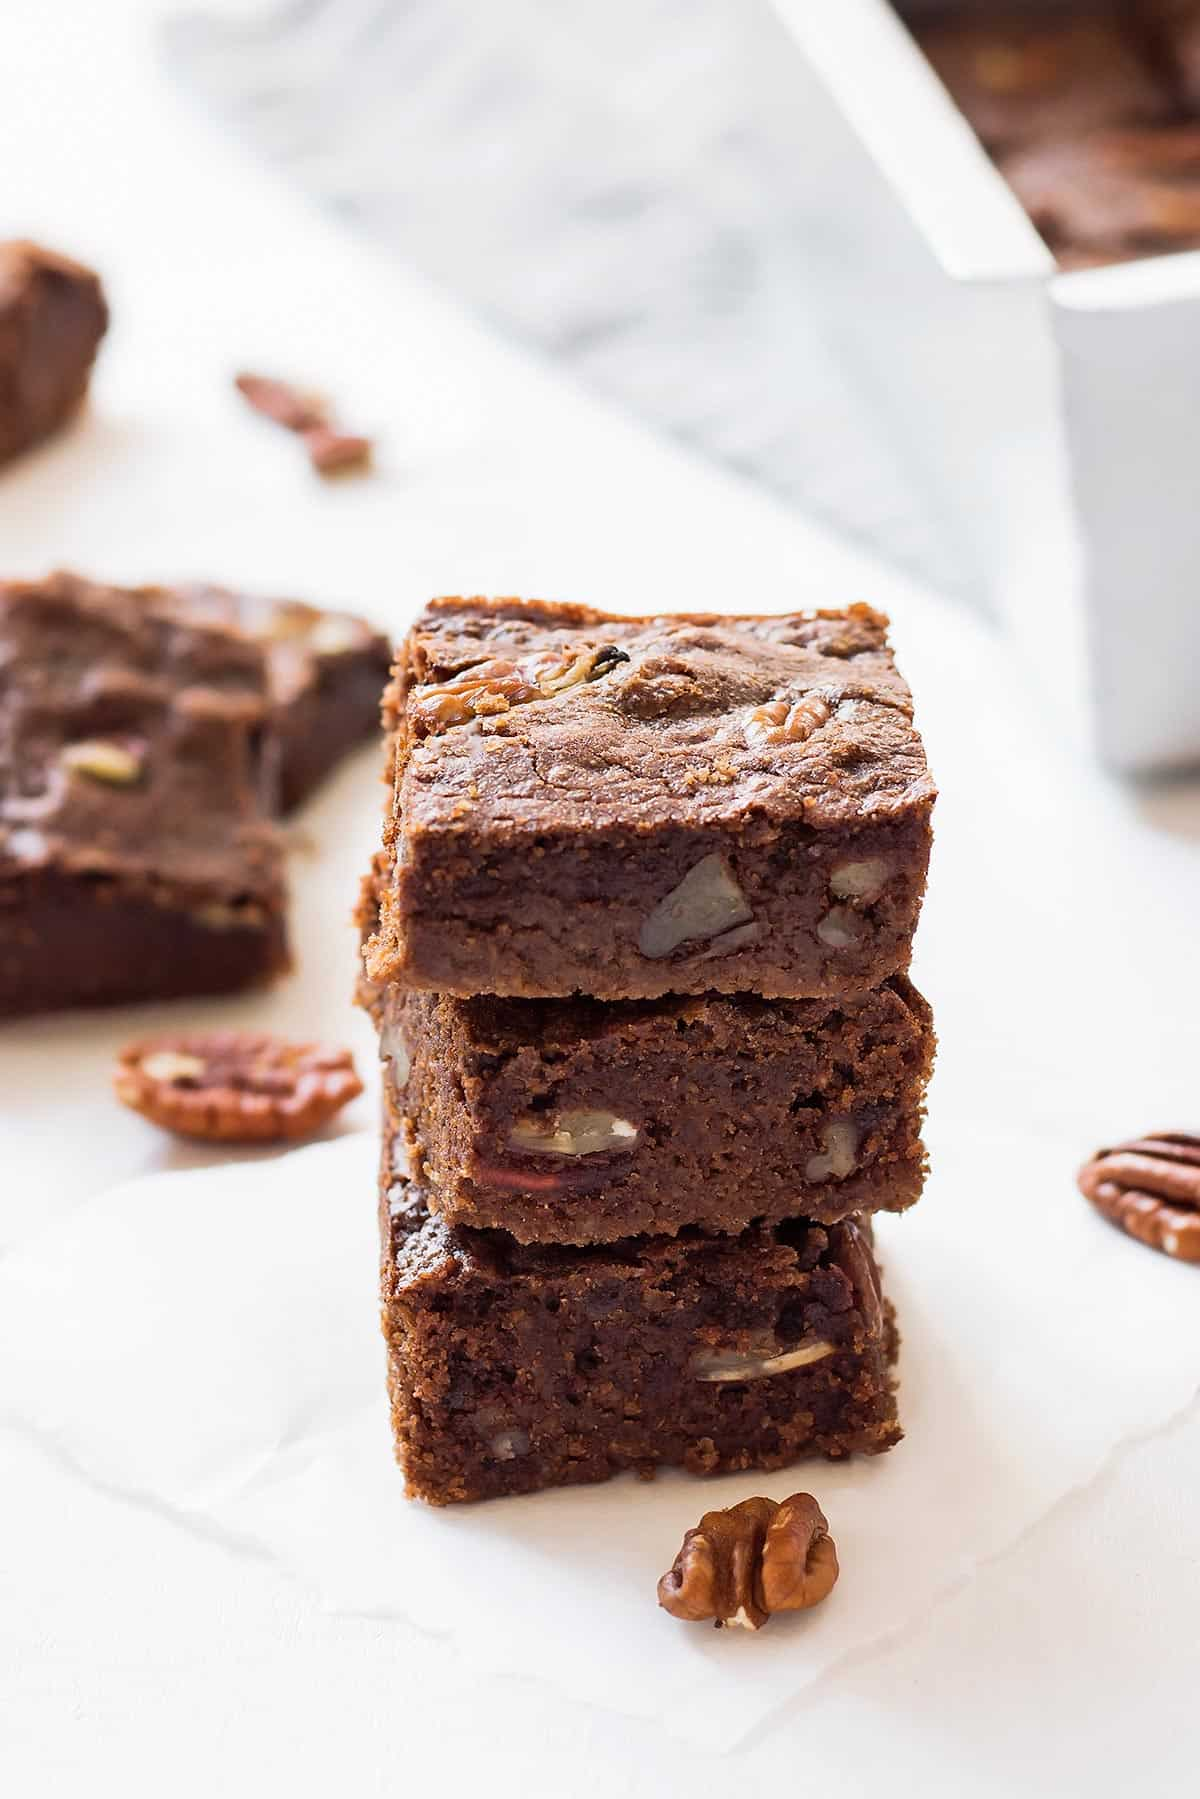 Stack of Three Keto Brownies